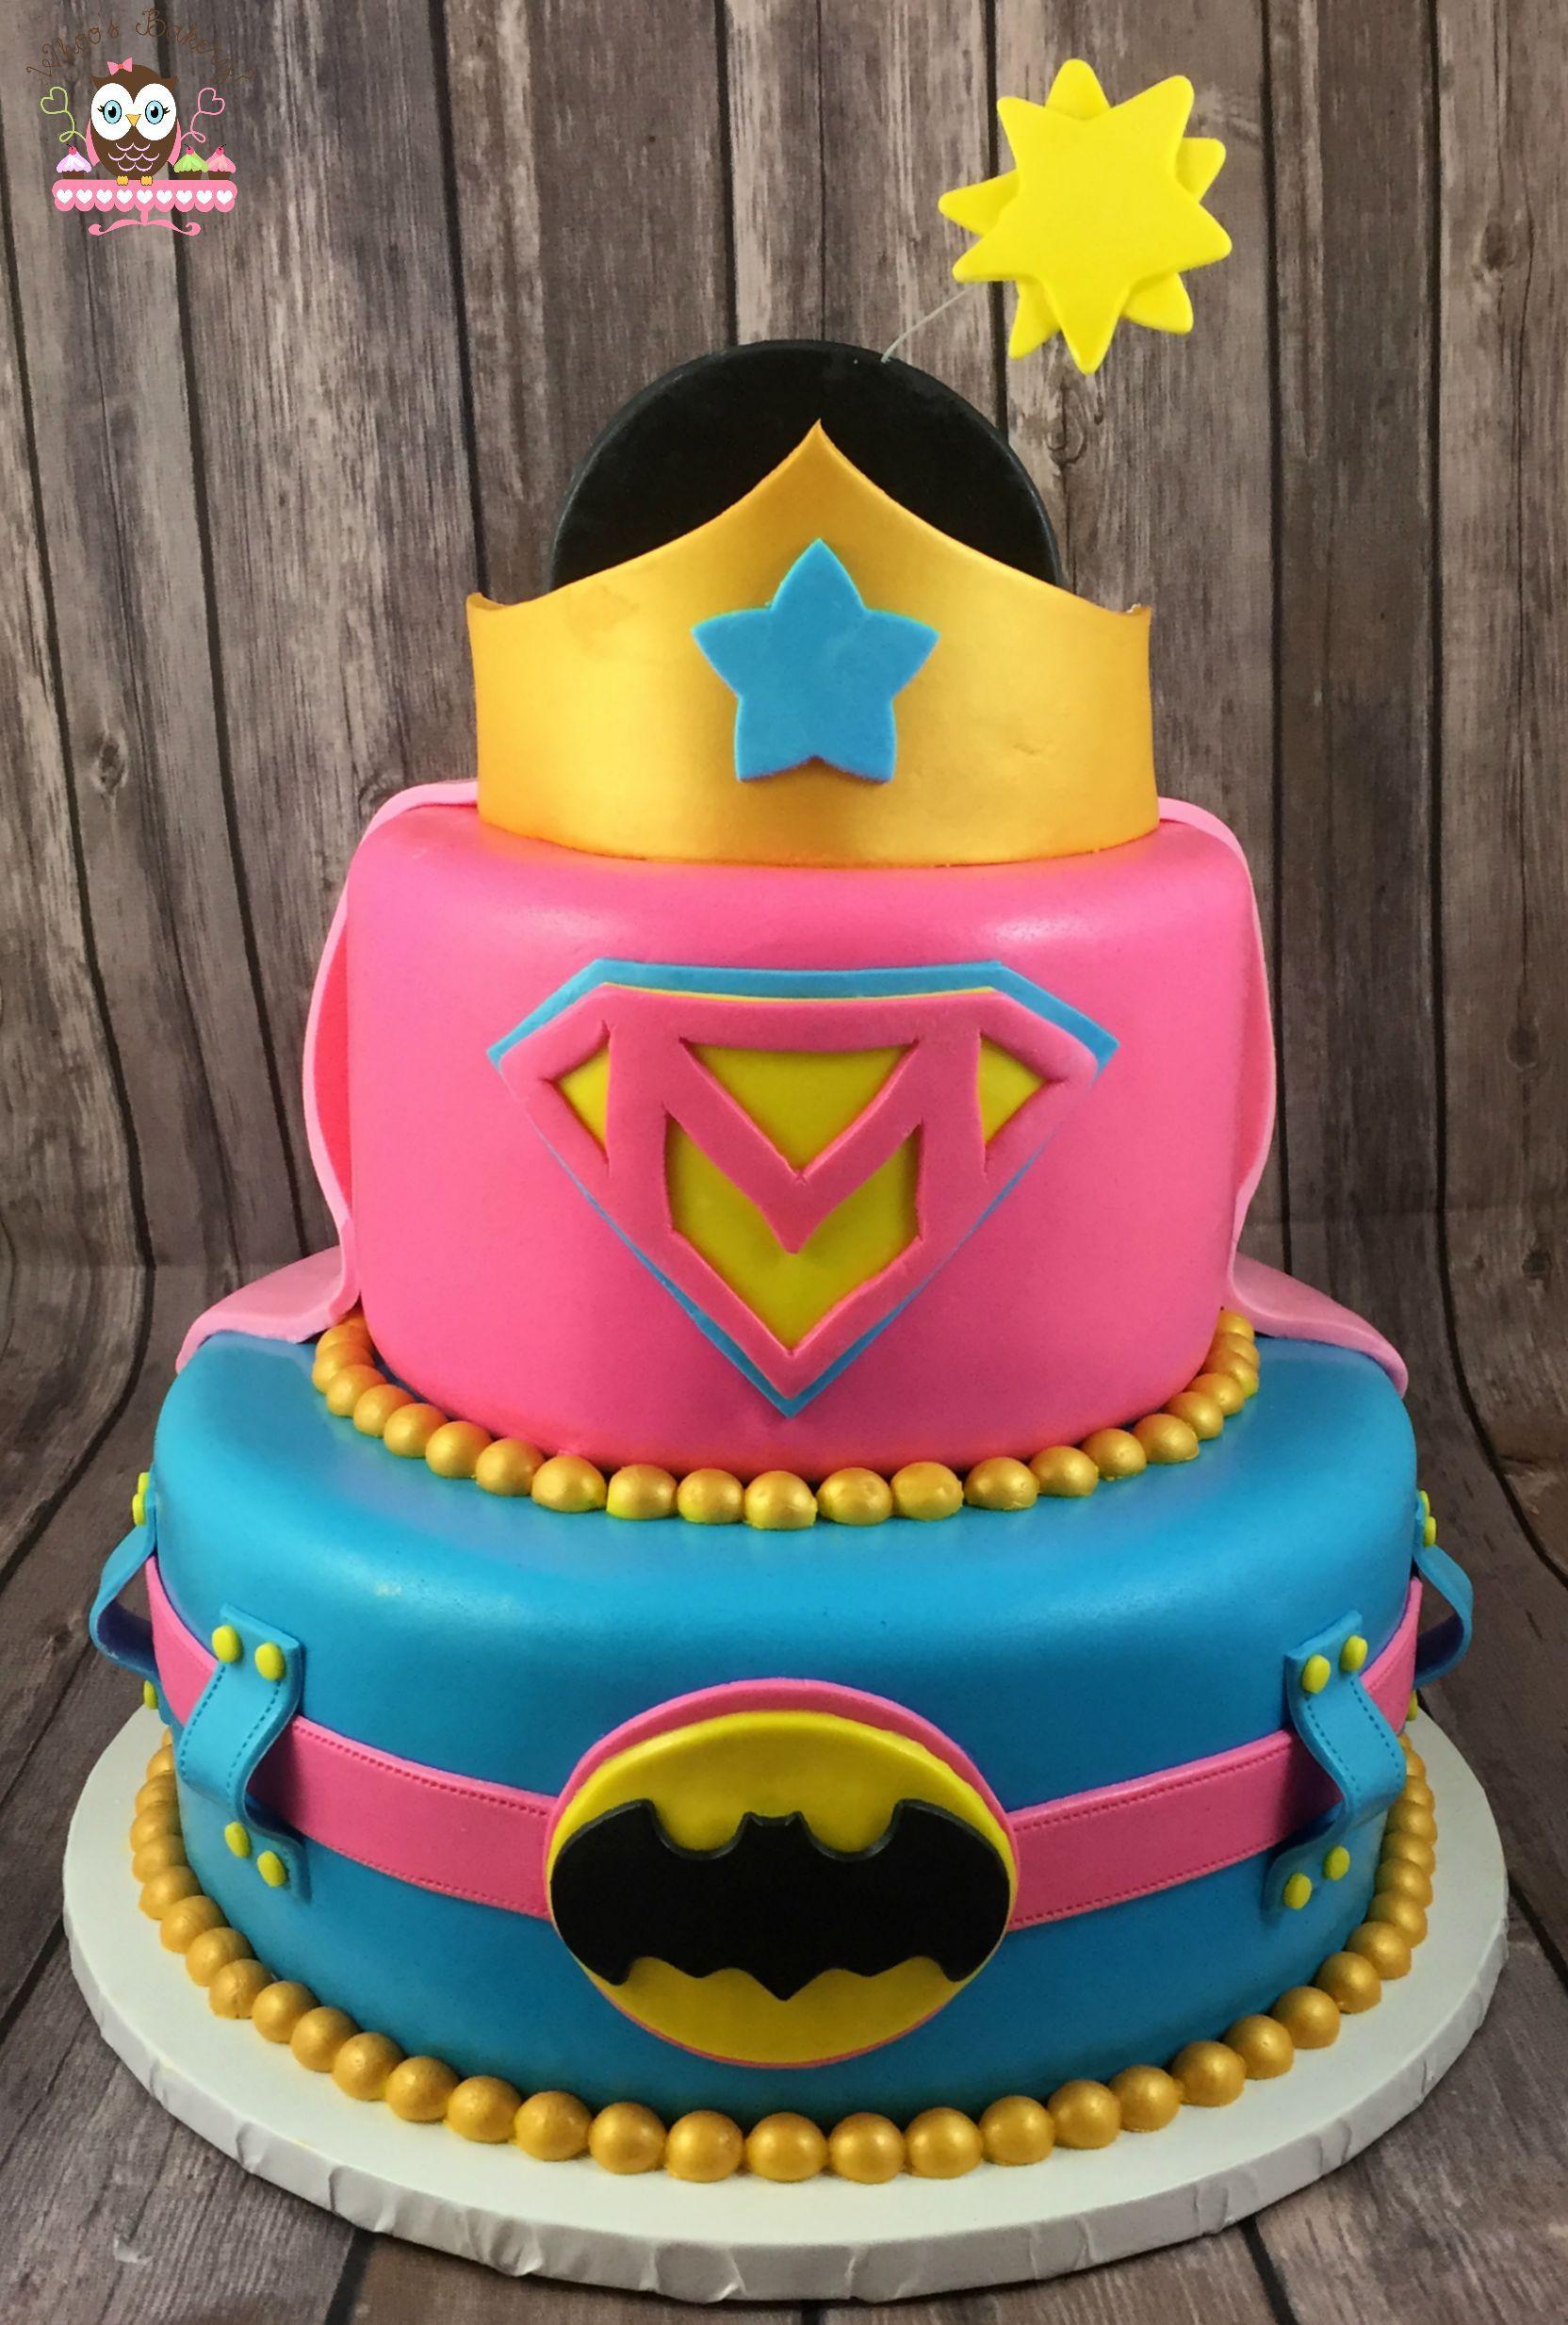 Best ideas about Superhero Birthday Cake . Save or Pin Superhero cake Girl Superhero Cake Pink superhero Now.